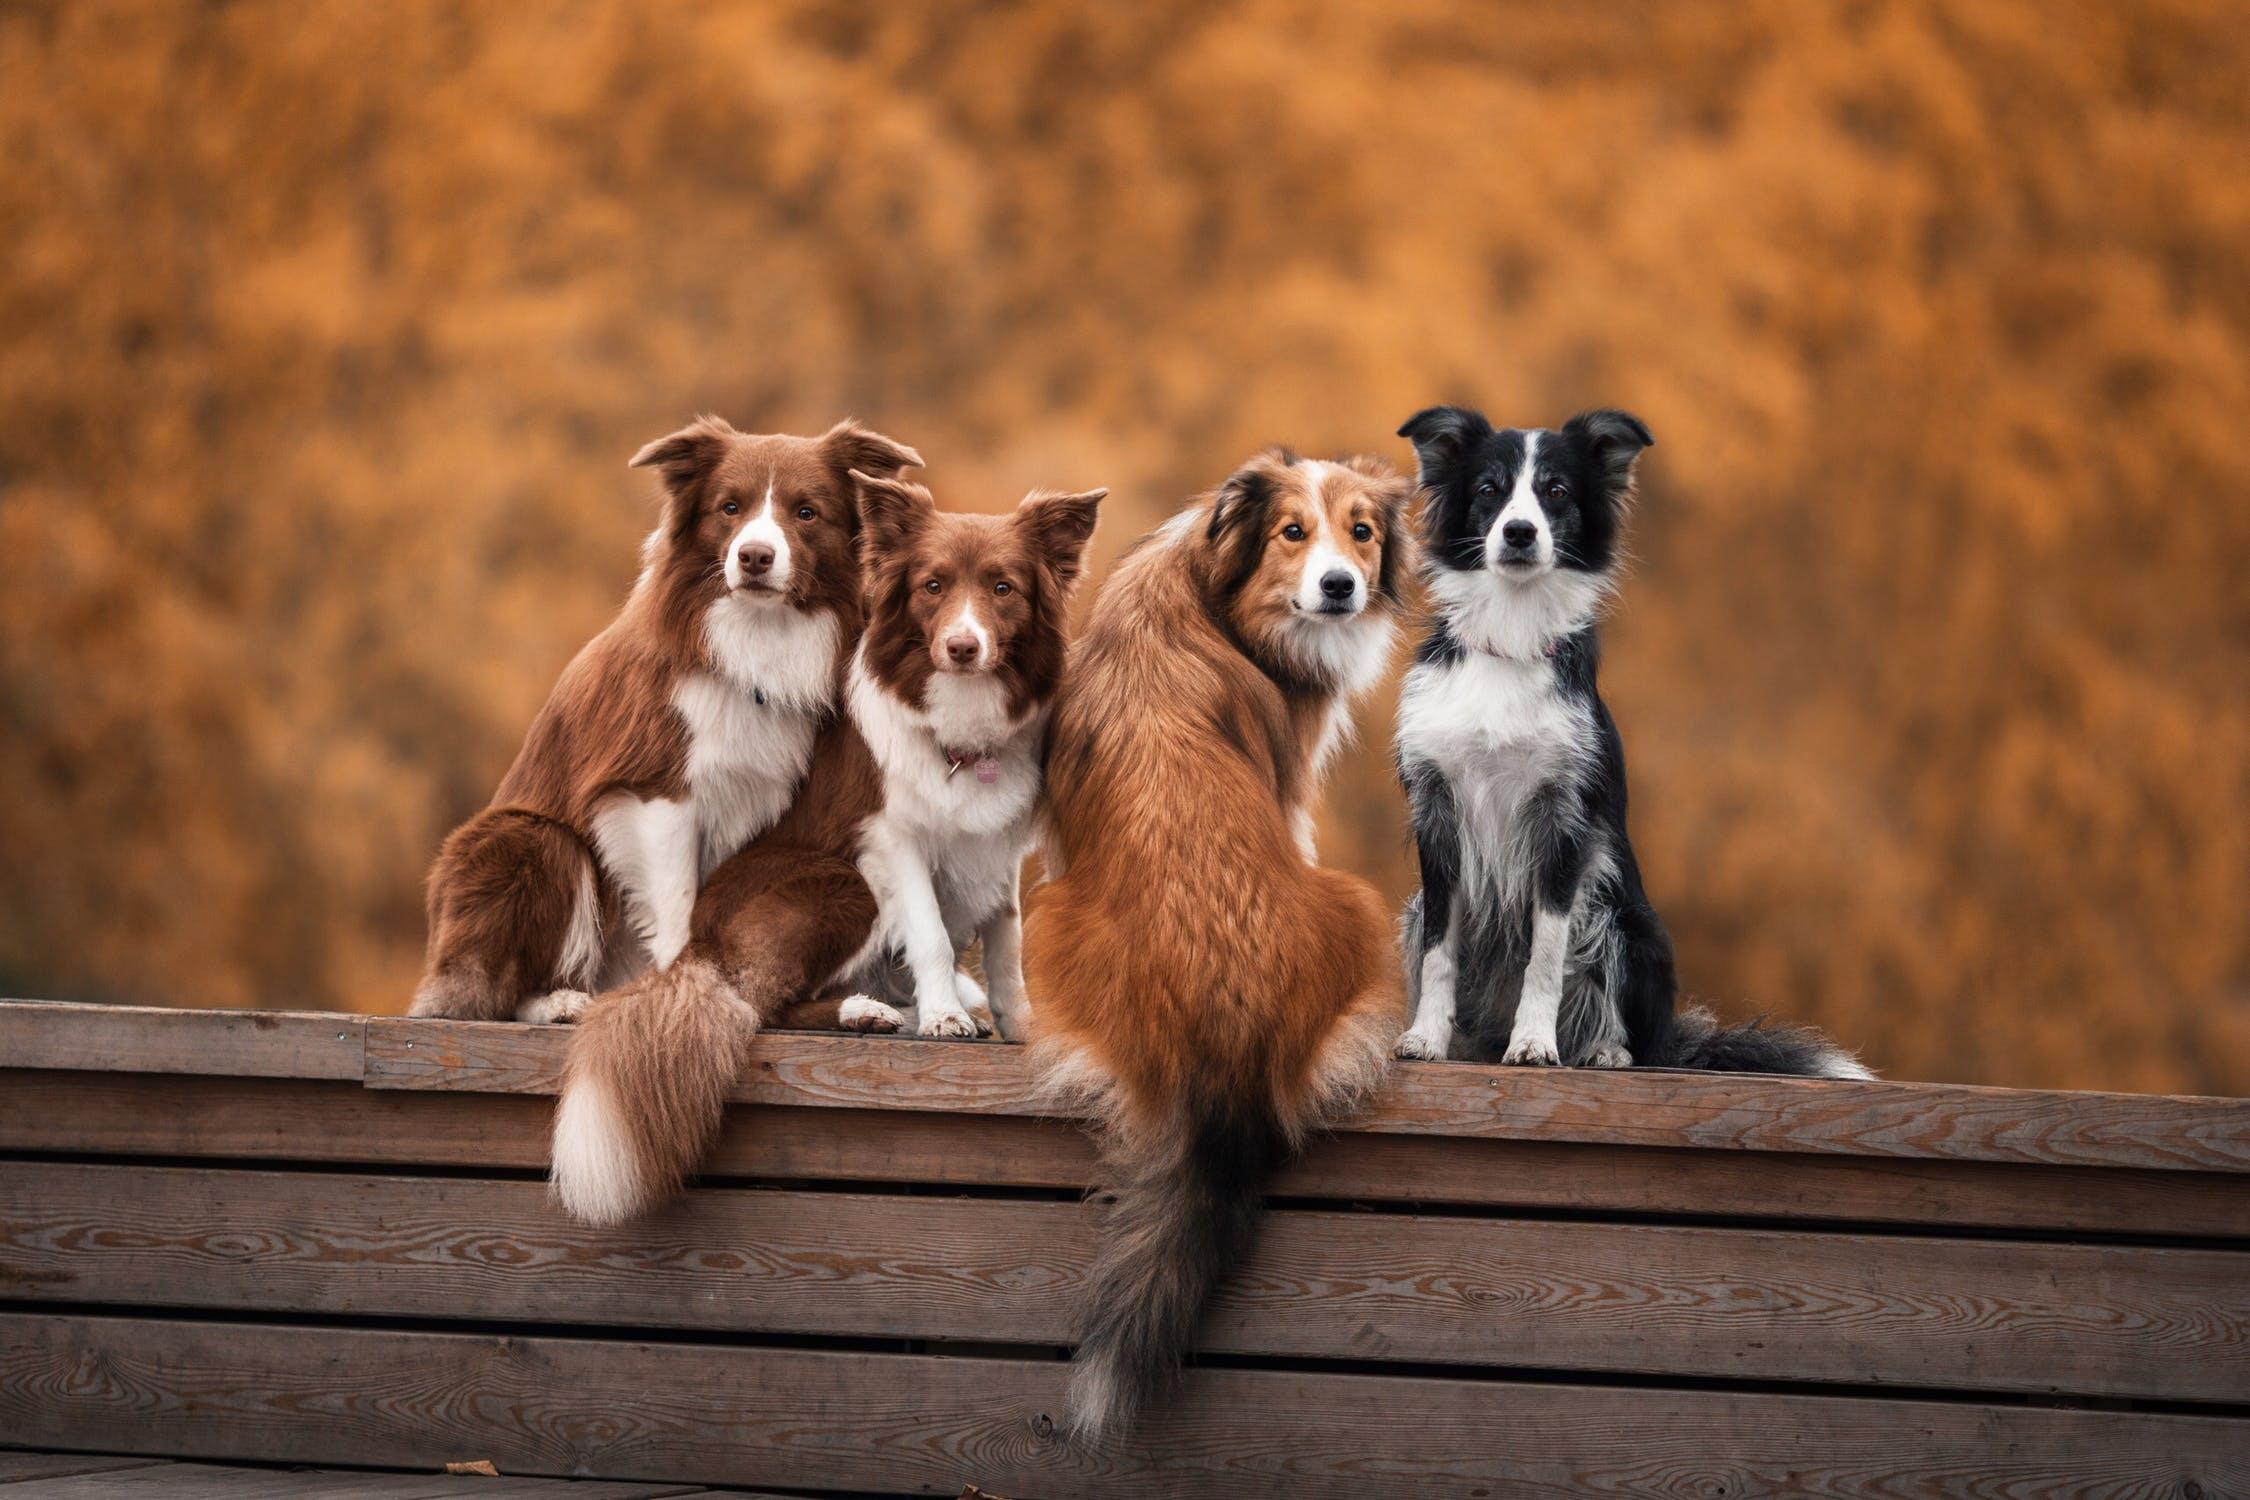 Sittande hundar